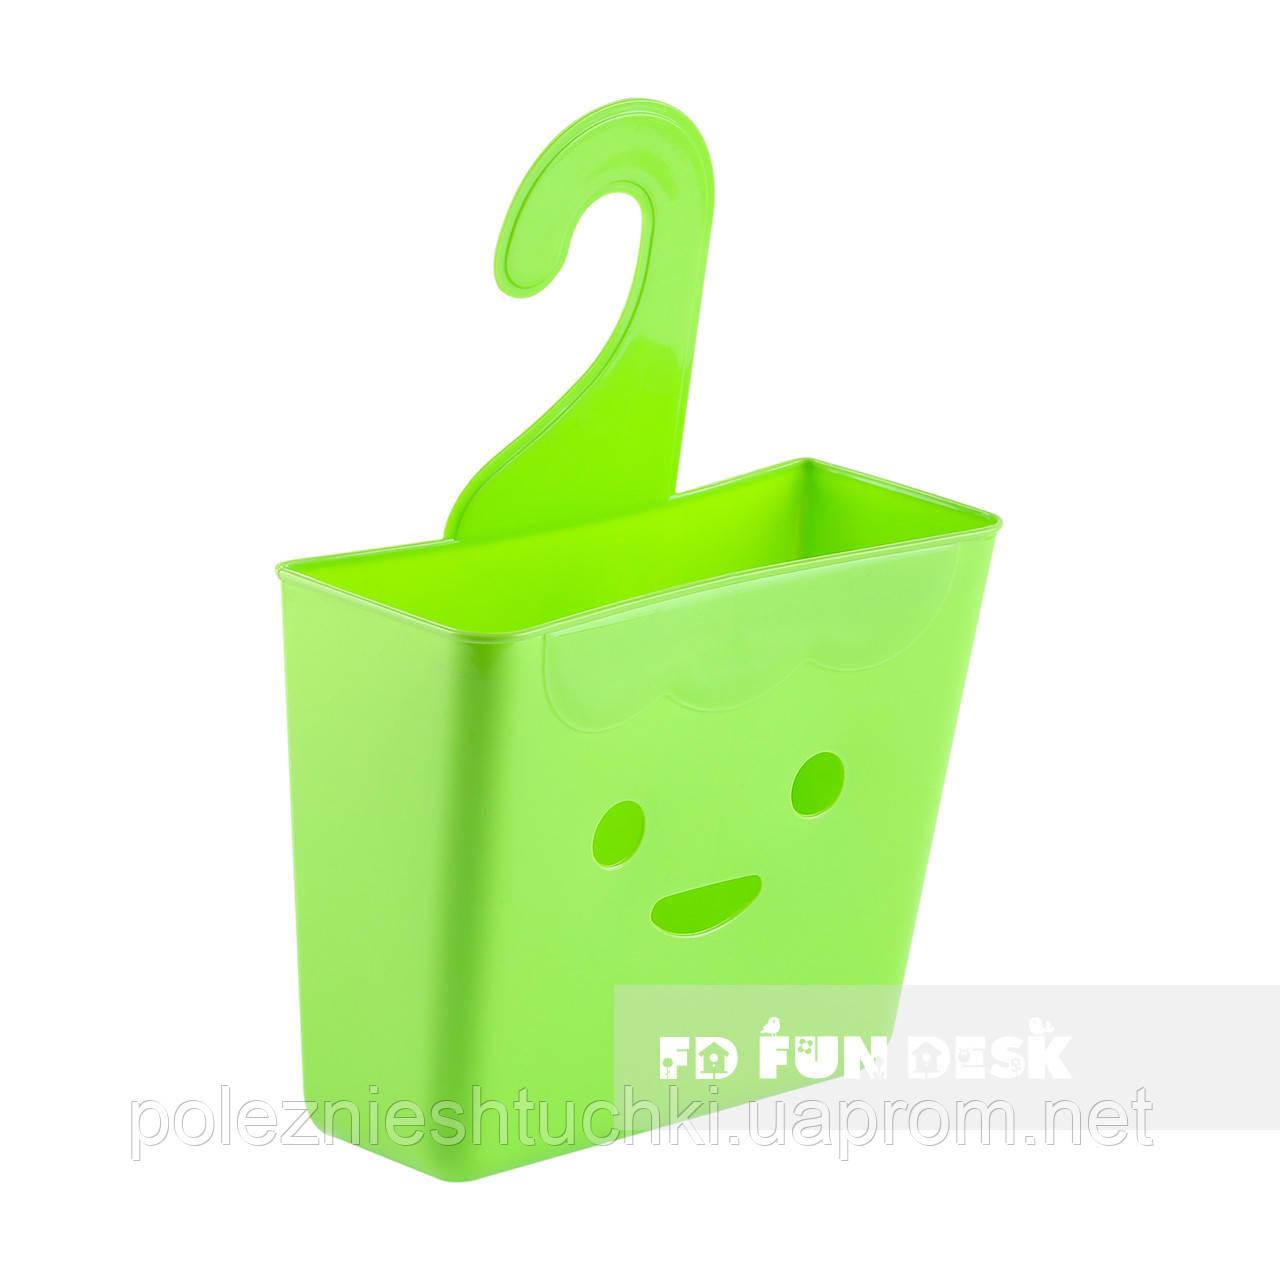 Корзинка для хранения MA 2 Green CUBBY